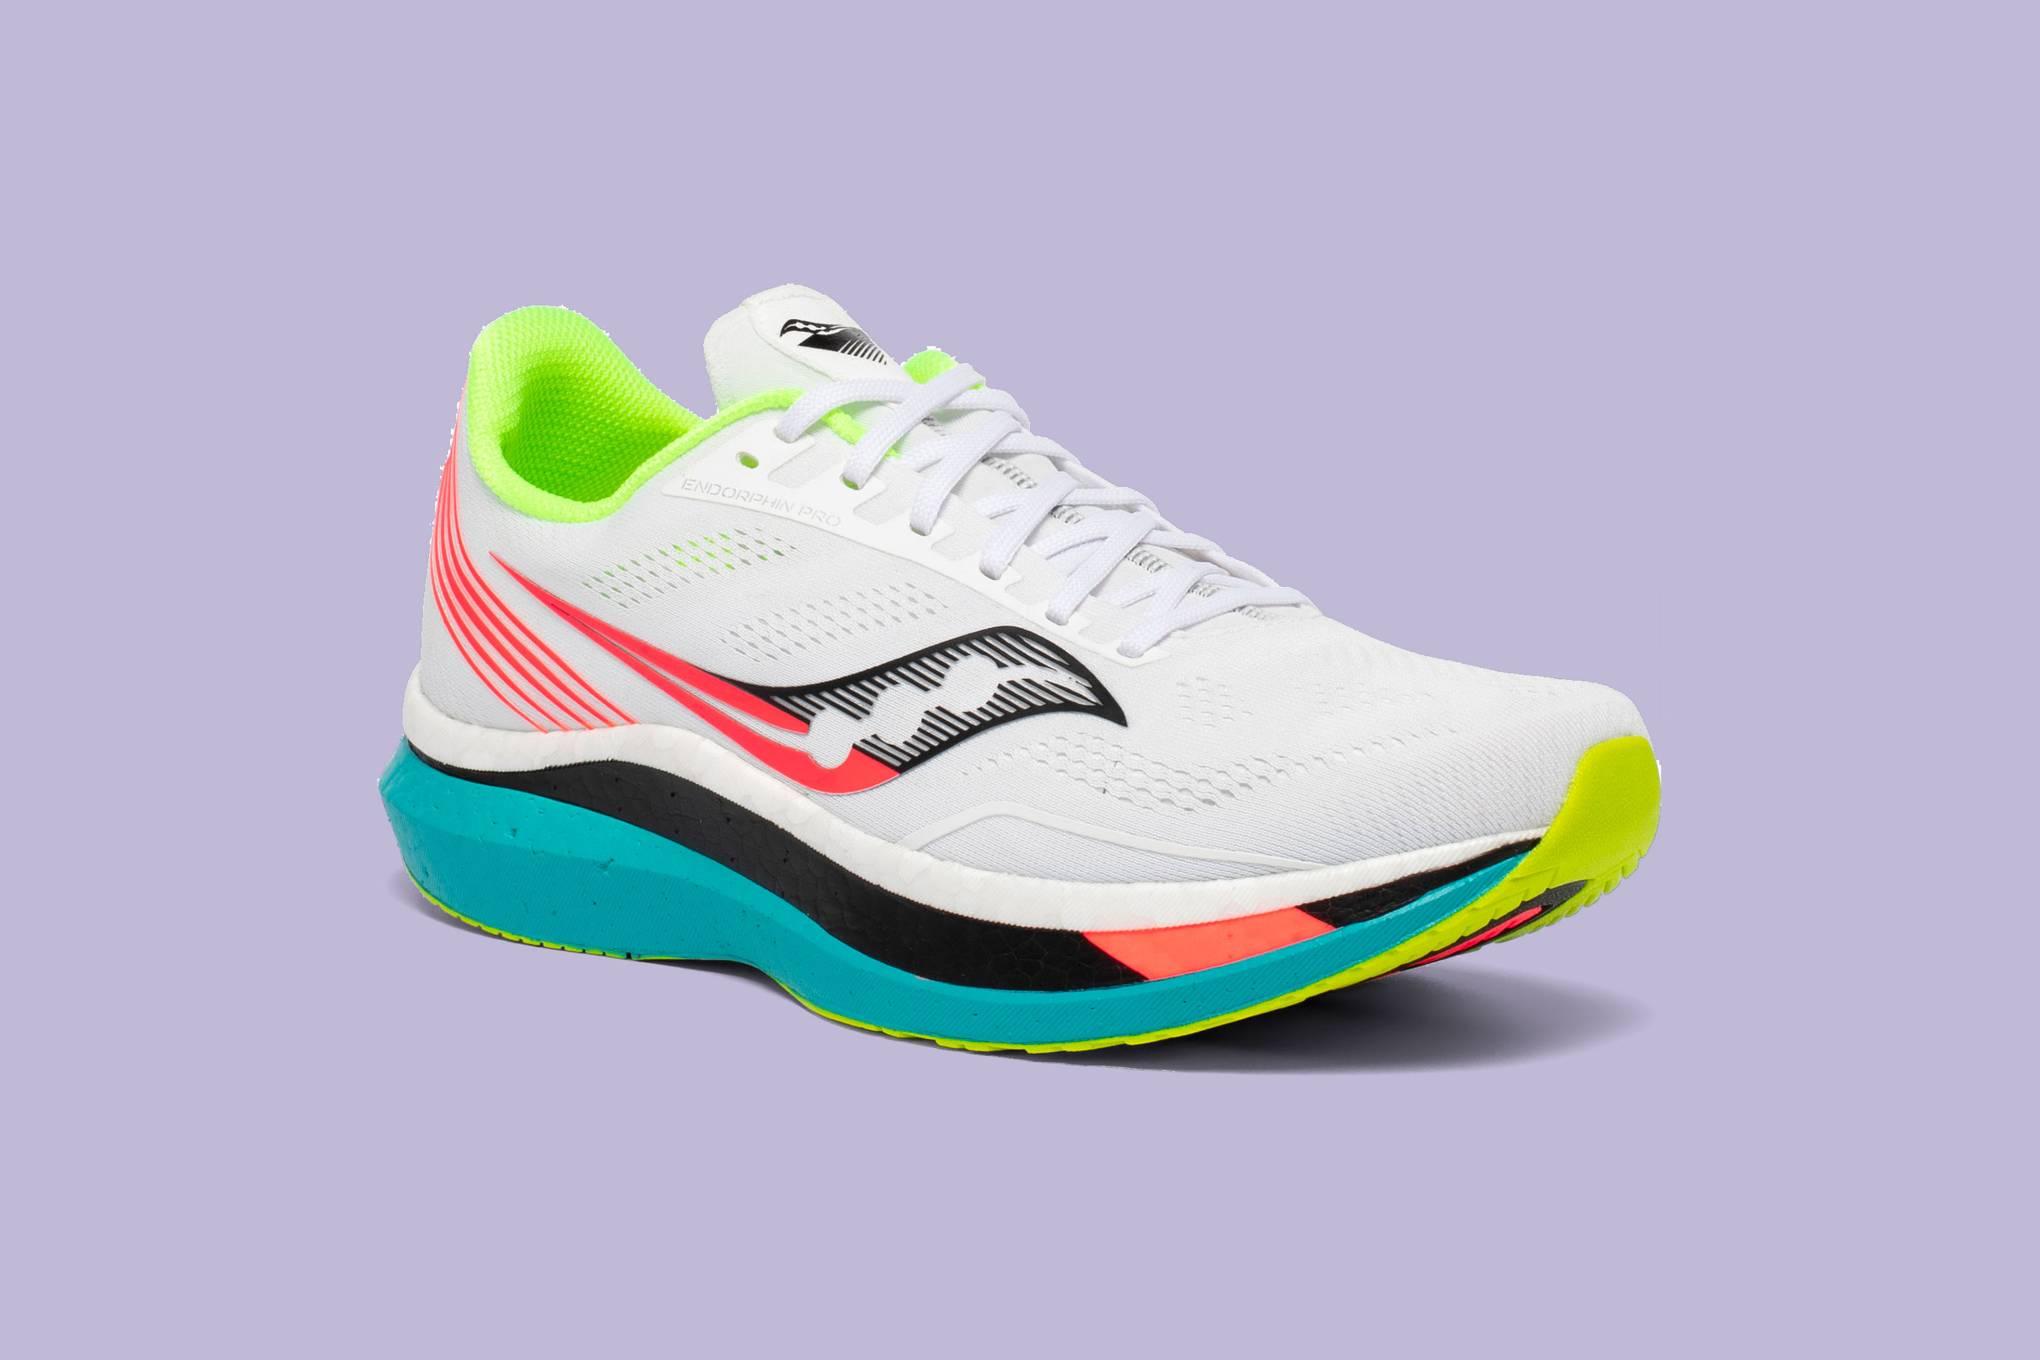 The best running shoes for men, women